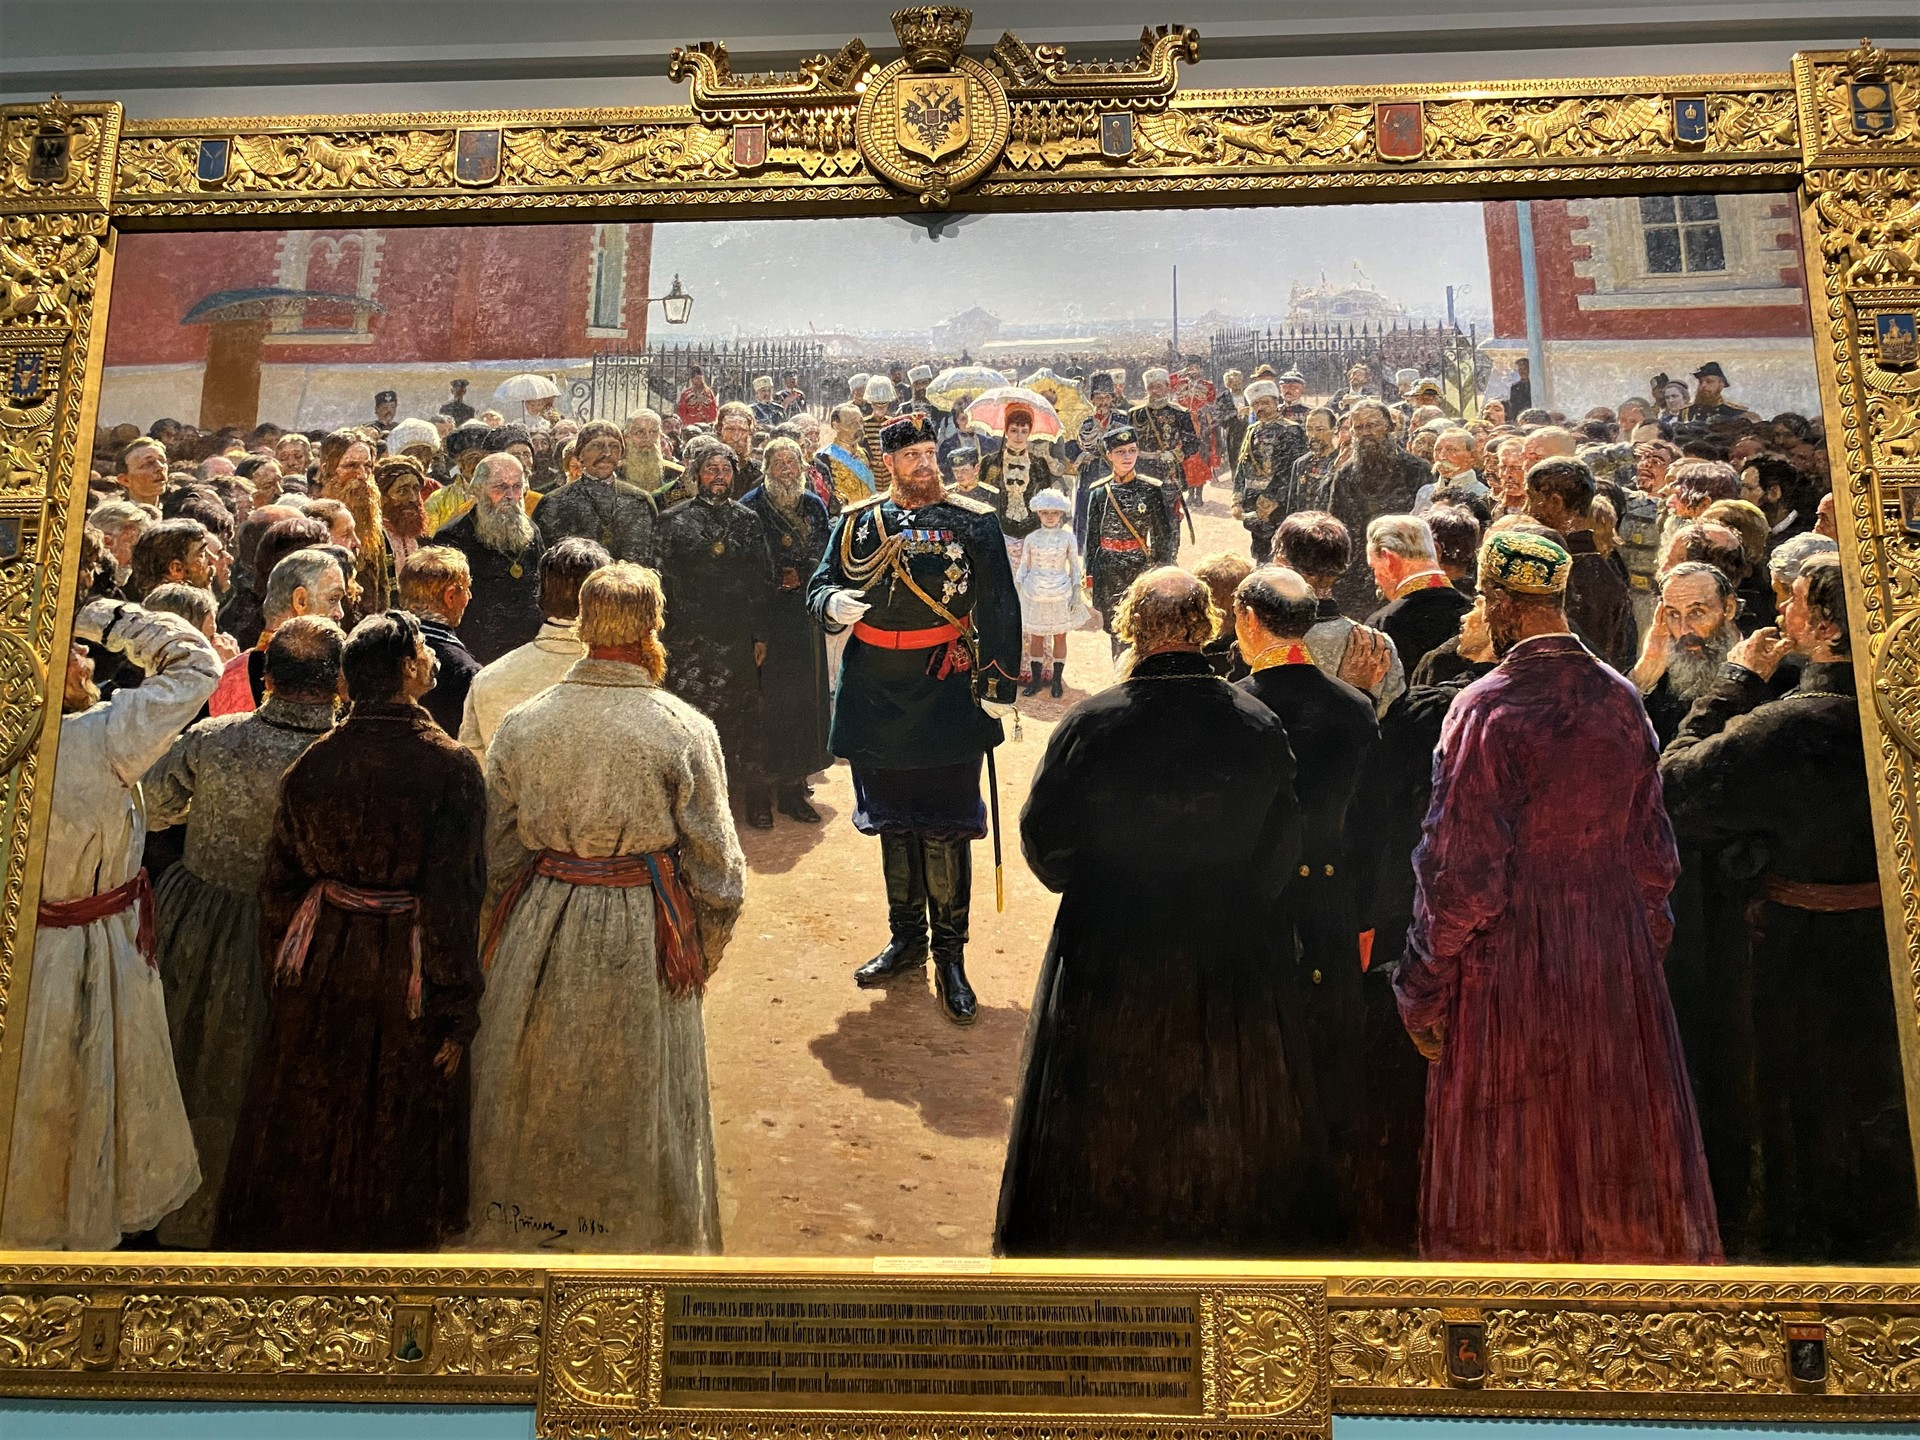 Alexandre III recevant les doyens des cantons